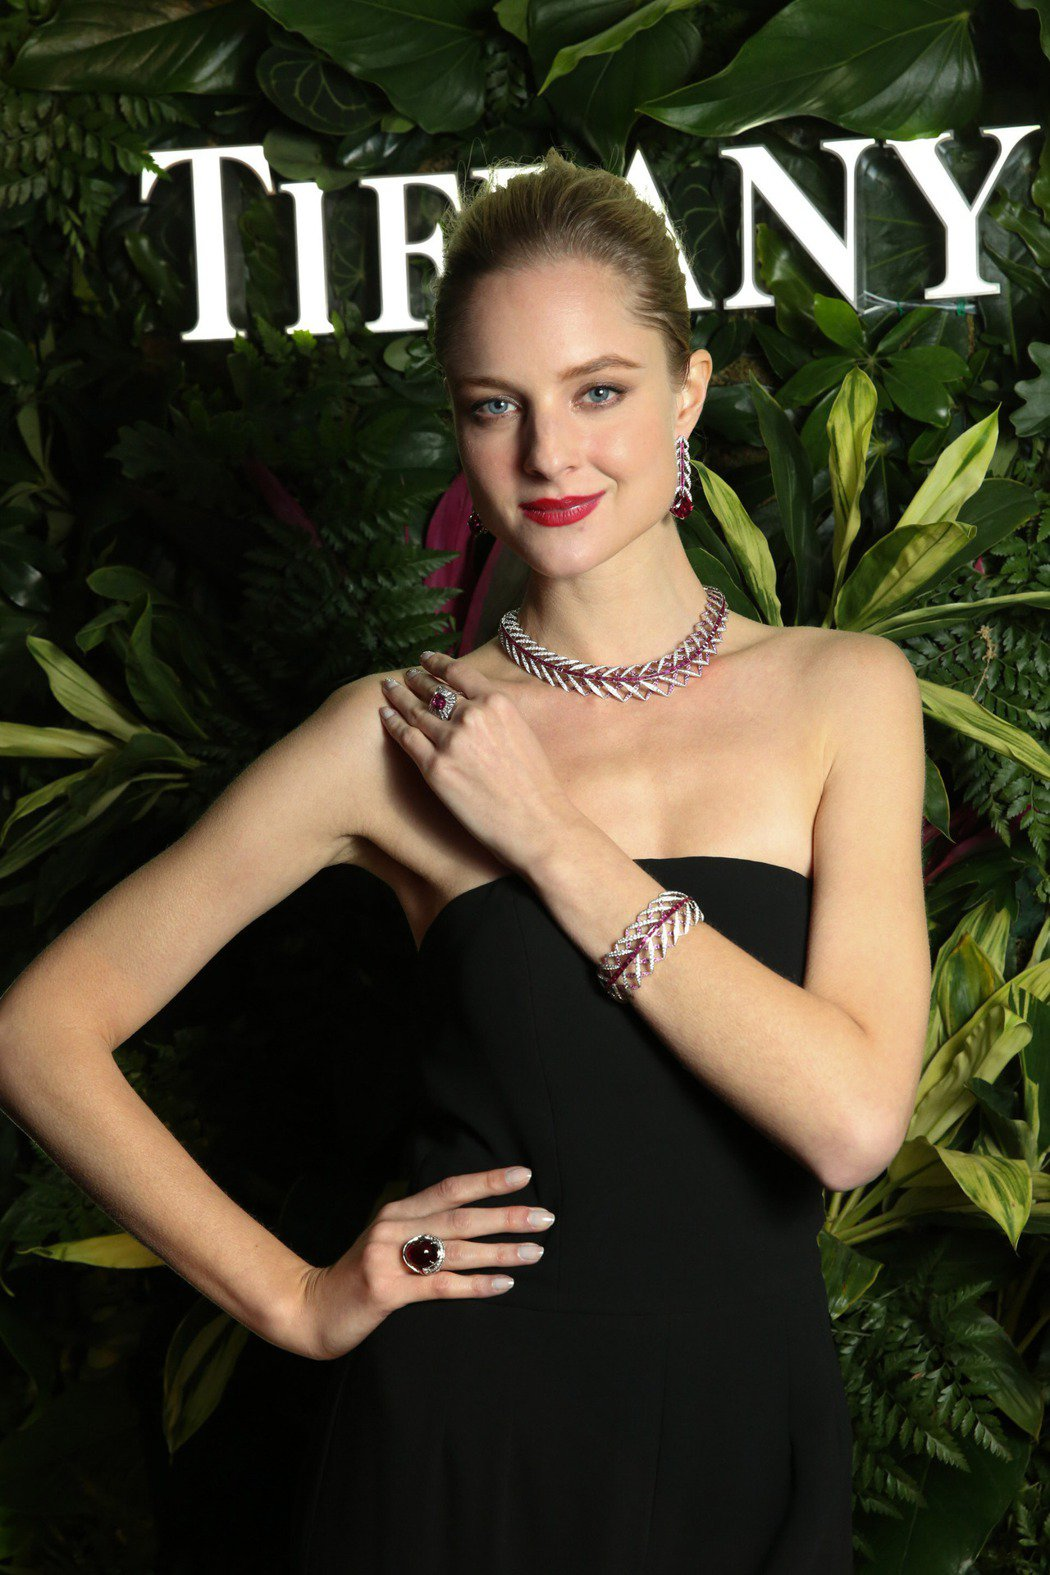 模特兒演繹Tiffany 2017 Blue Book高級珠寶系列。圖╱Tiff...